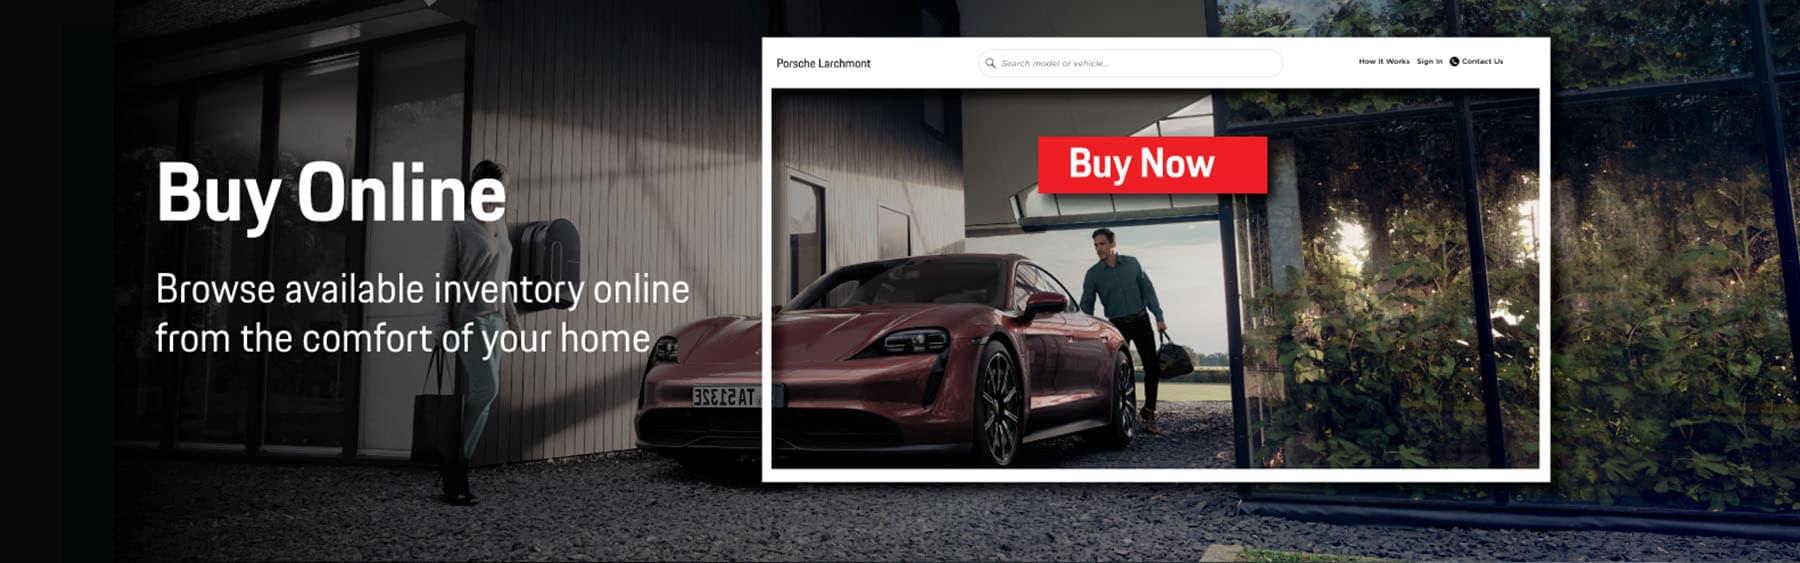 Porsche Lachmont express store banner